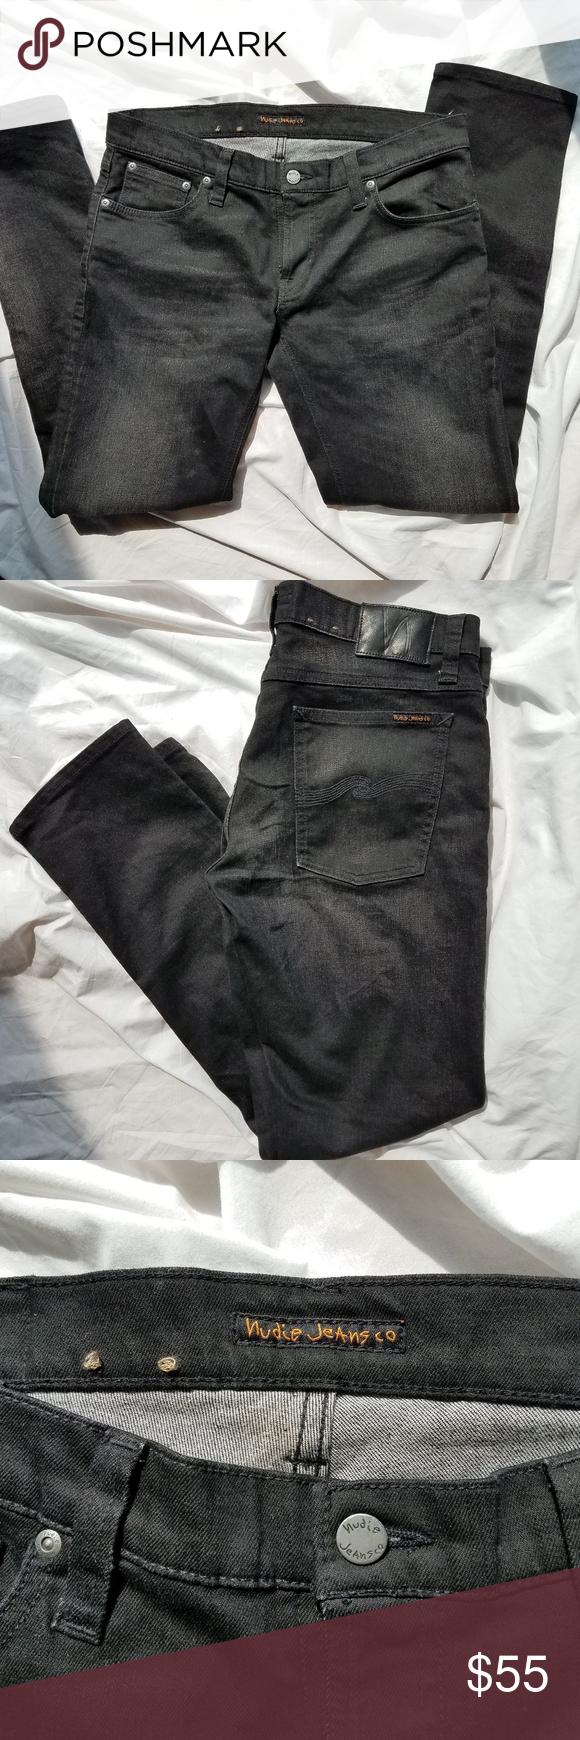 814060bf Nudie Jeans Long John Black Blizzard 33x30 Waist 33, Length 30. Super tight  fit. Gunmetal trims, zip fly. Nudie Jeans Jeans Skinny